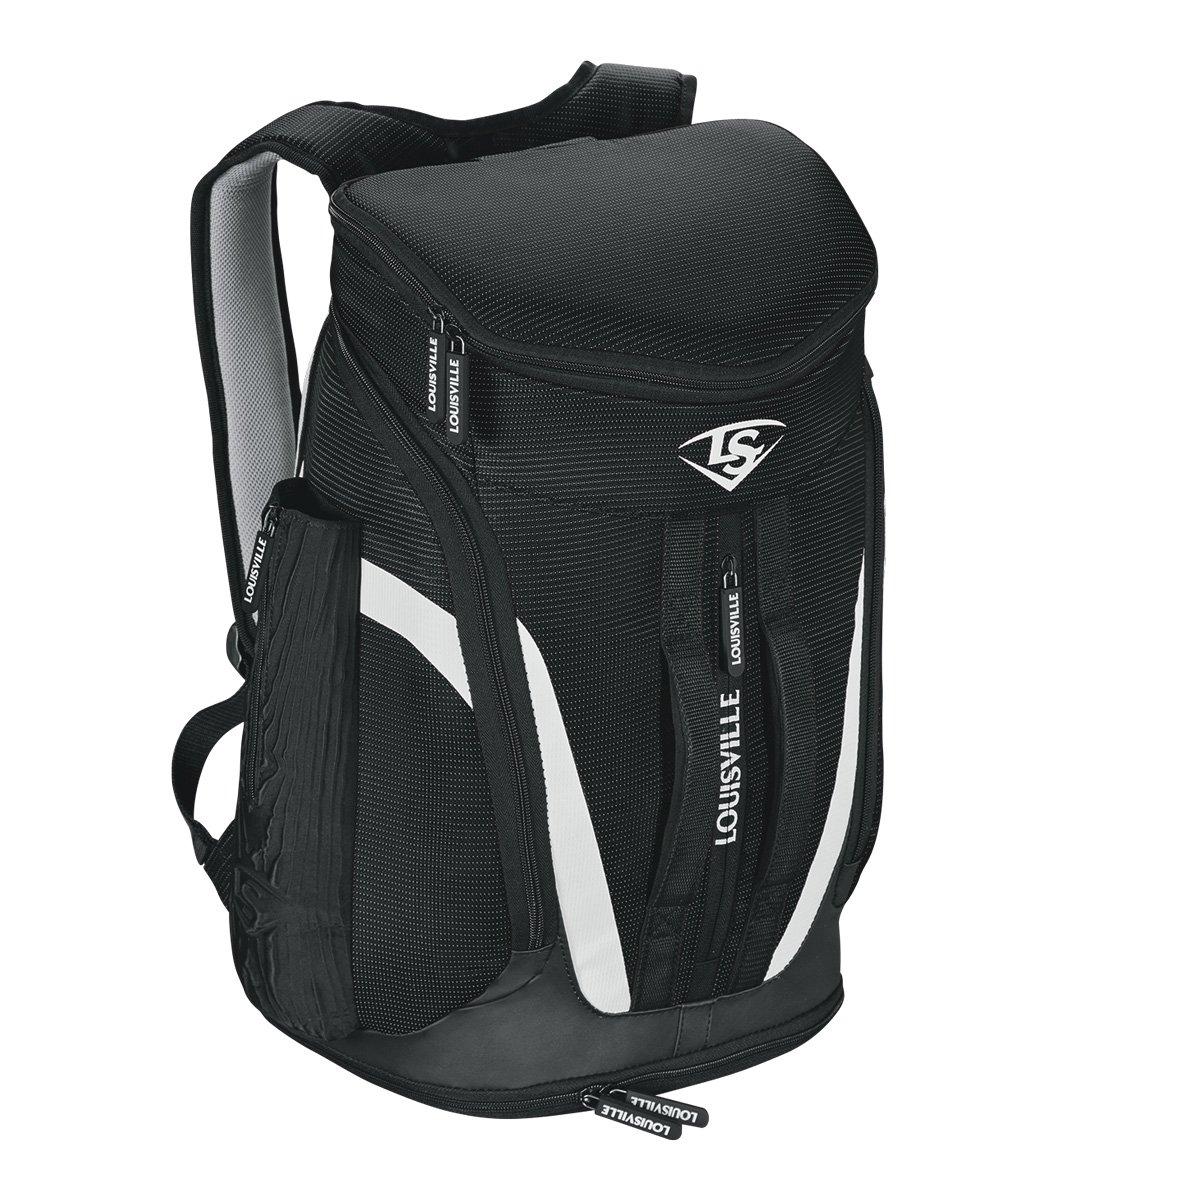 922c4840e7df Amazon.com   Louisville Slugger Select Stick Pack - Black   Sports    Outdoors